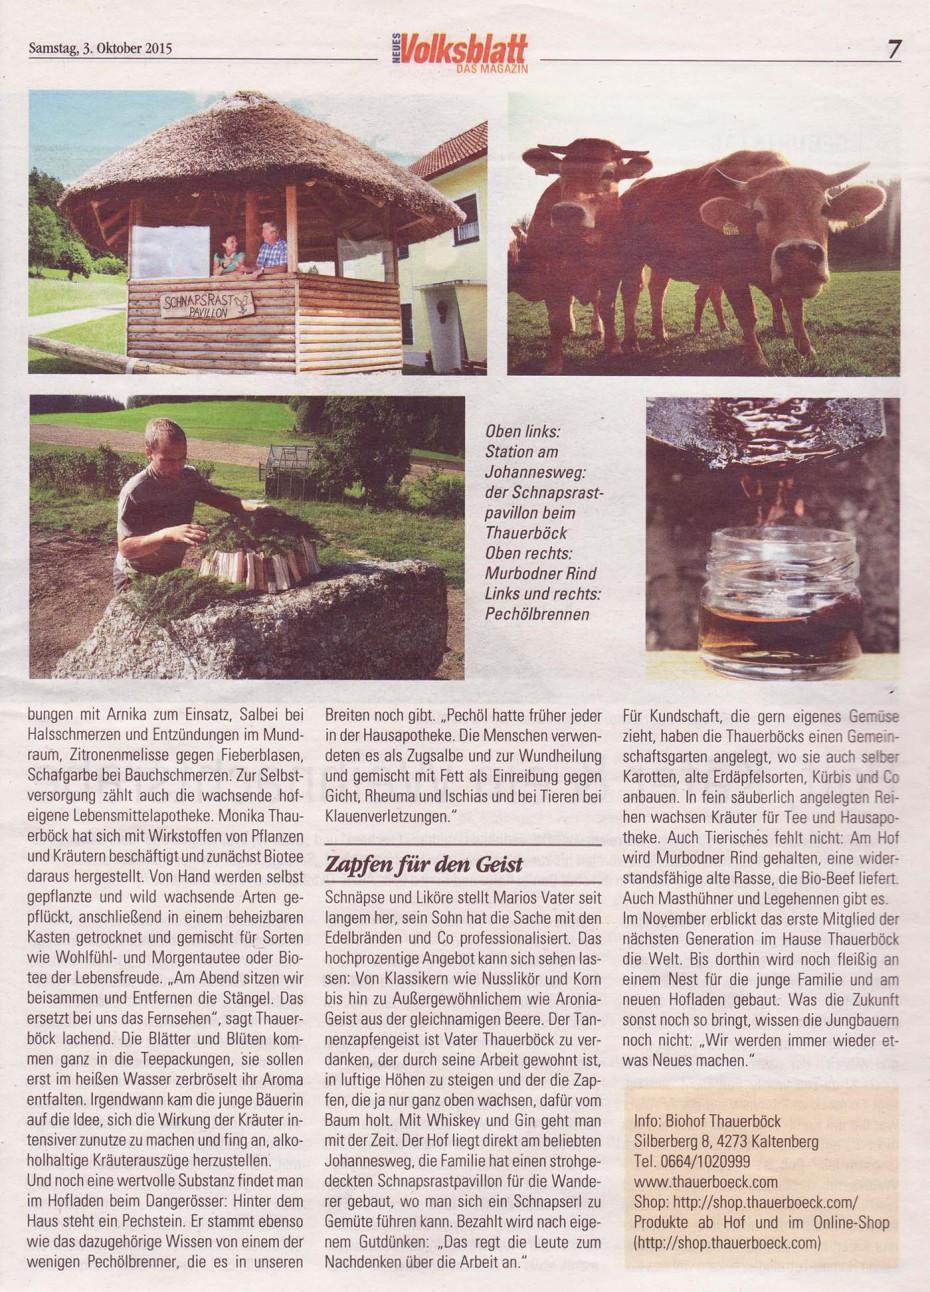 Volksblatt Biohof 7